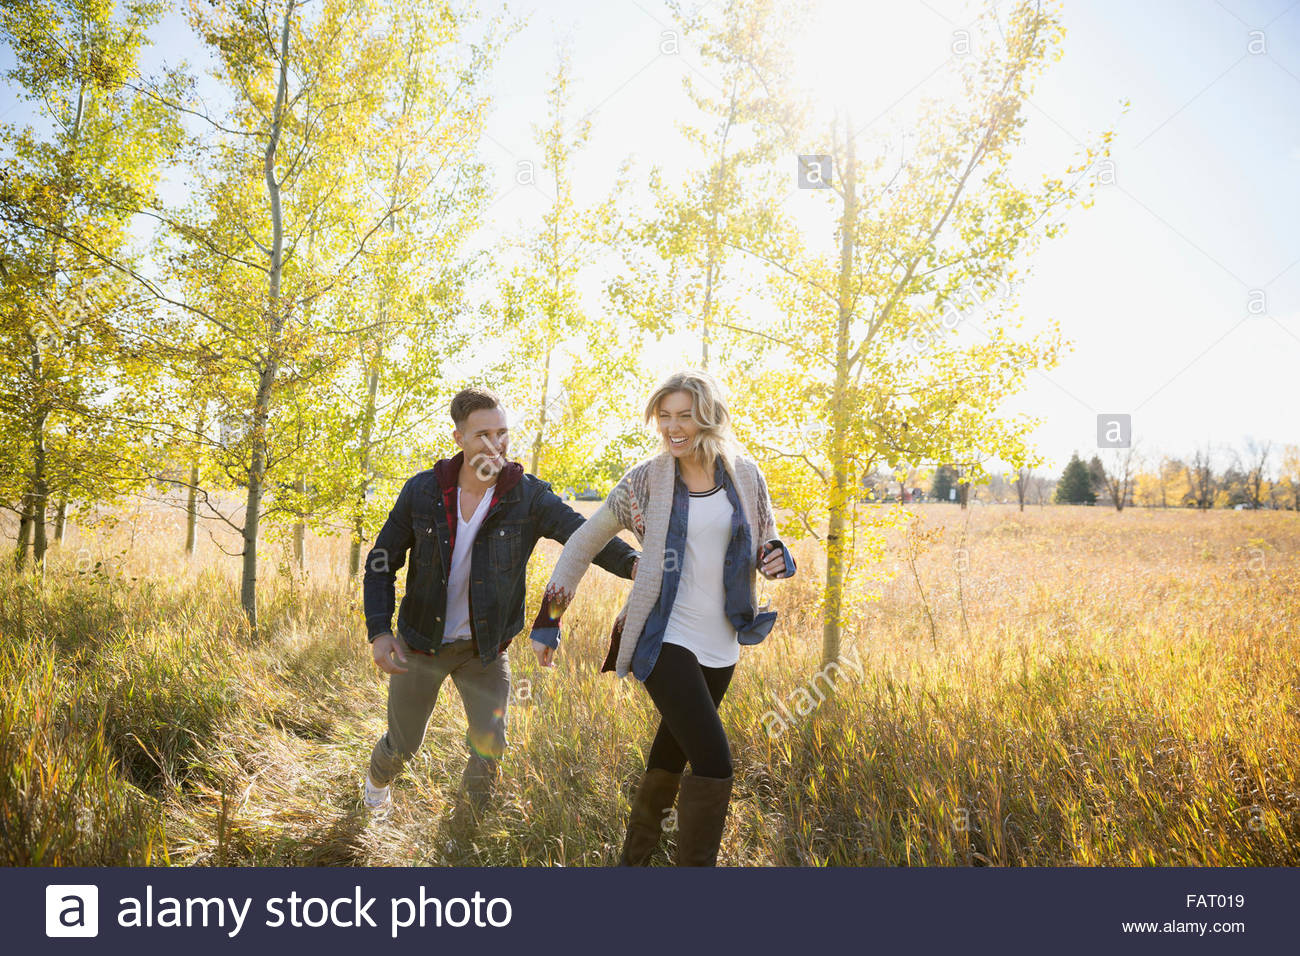 Paar im sonnigen Feld laufen Stockbild